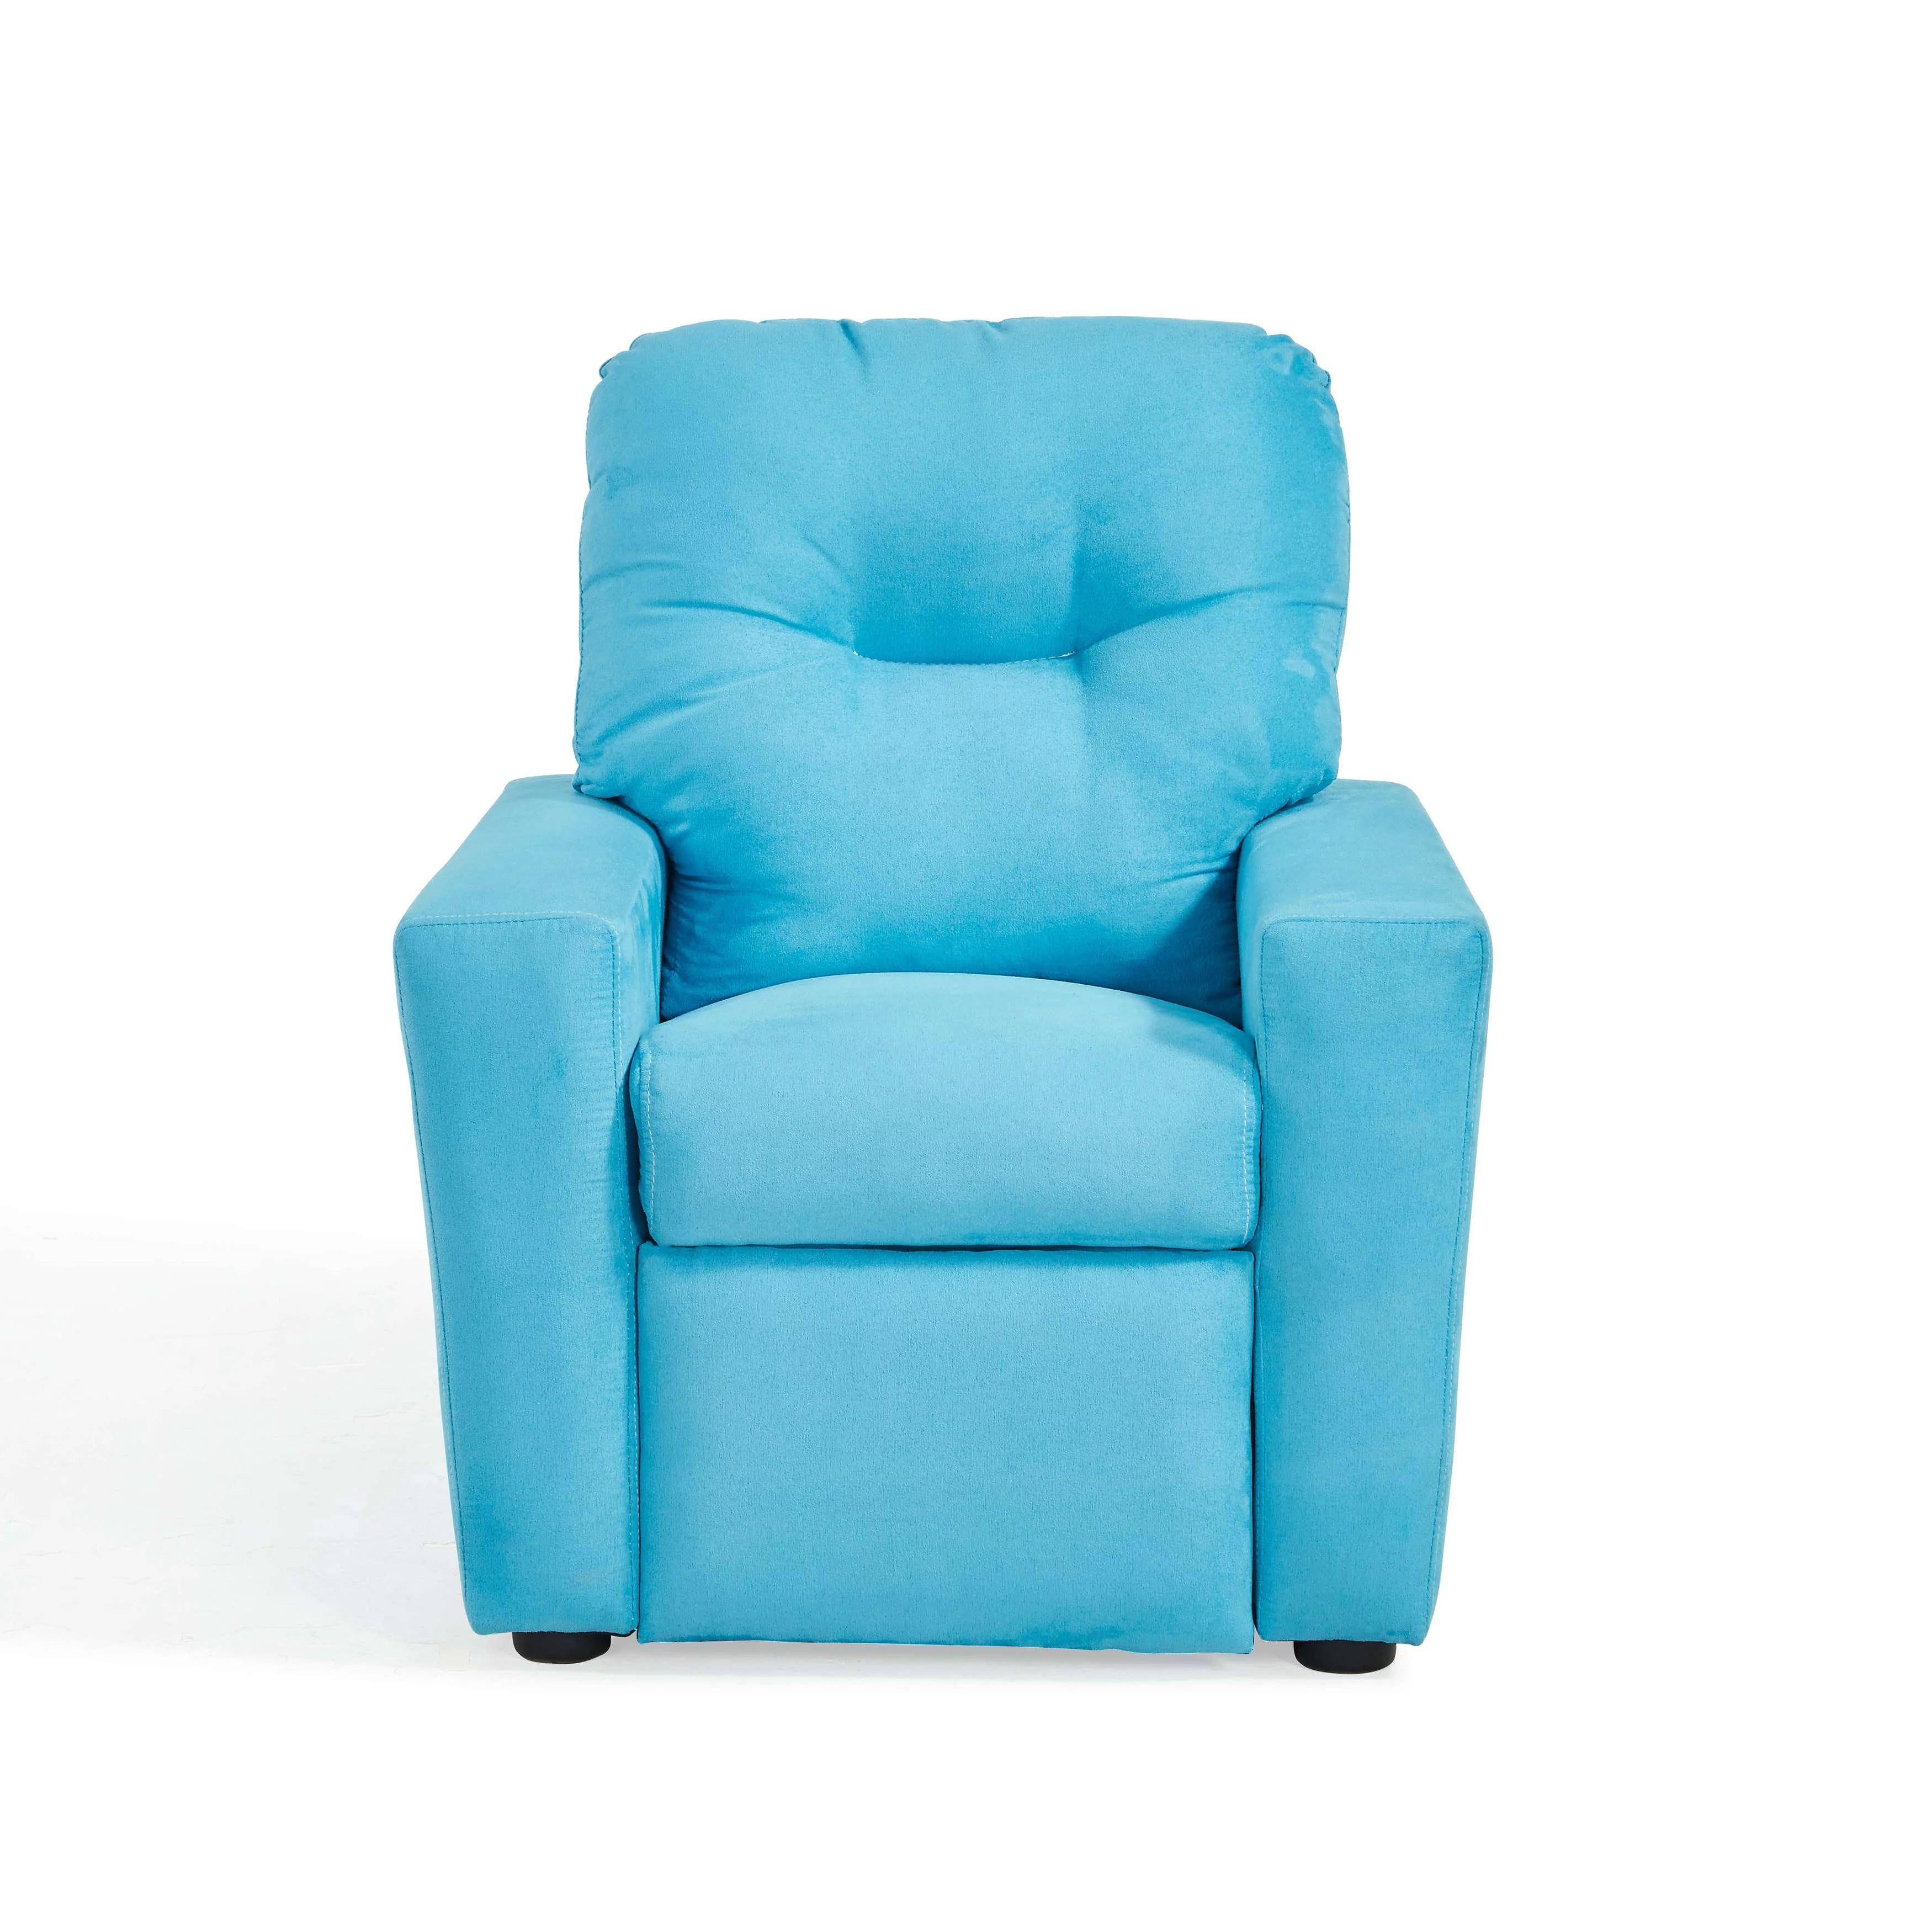 mainstays upholstered microfiber kids recliner multiple colors